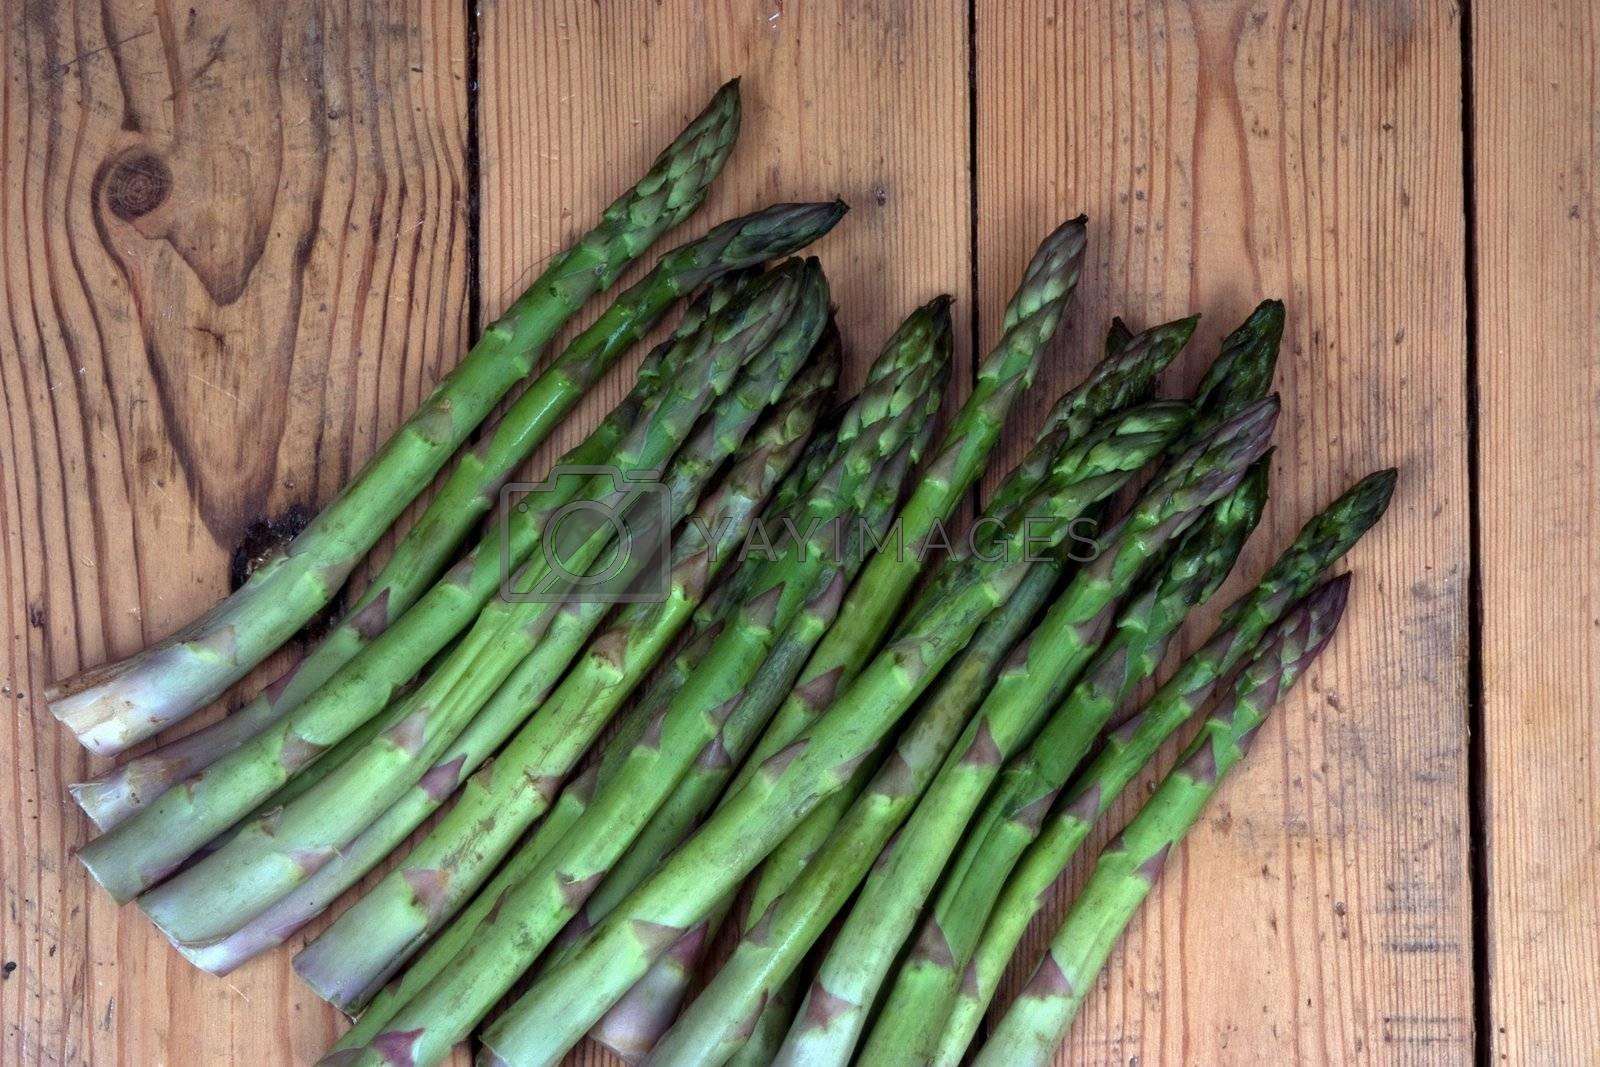 Freshly harvested by runamock